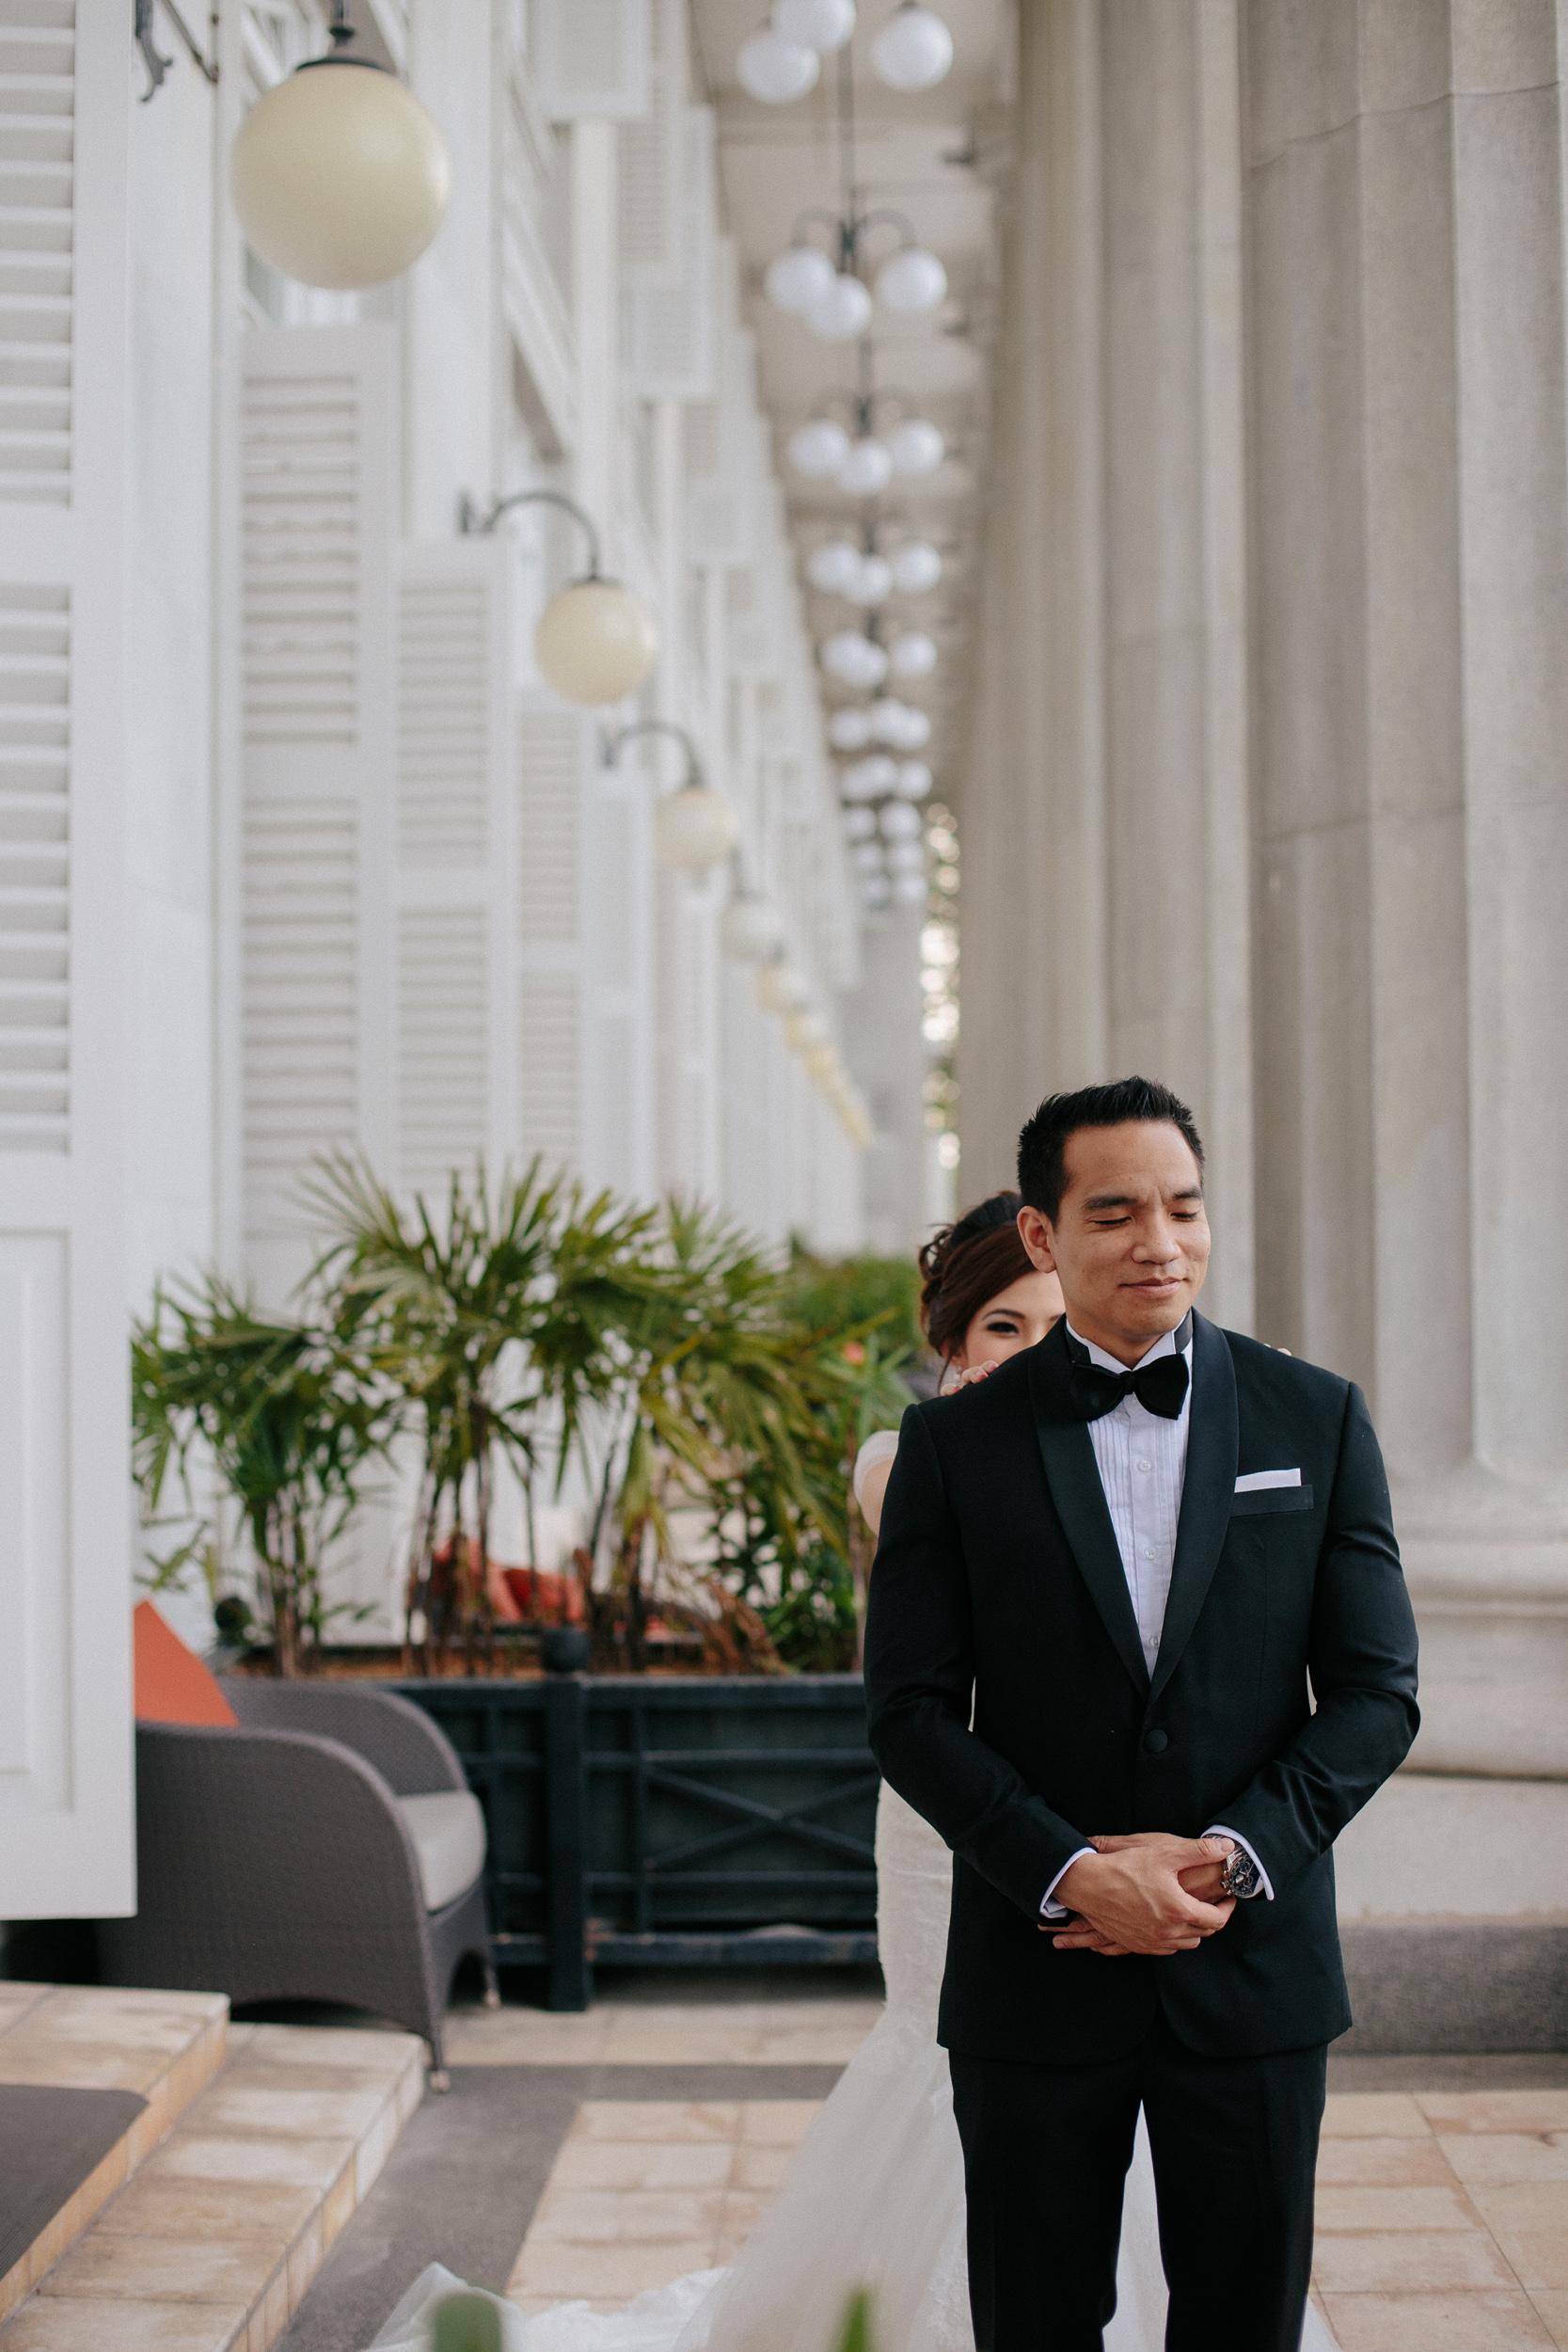 singapore-wedding-photographer-cheryl-matthew-fullerton-hotel-wedding-40.jpg